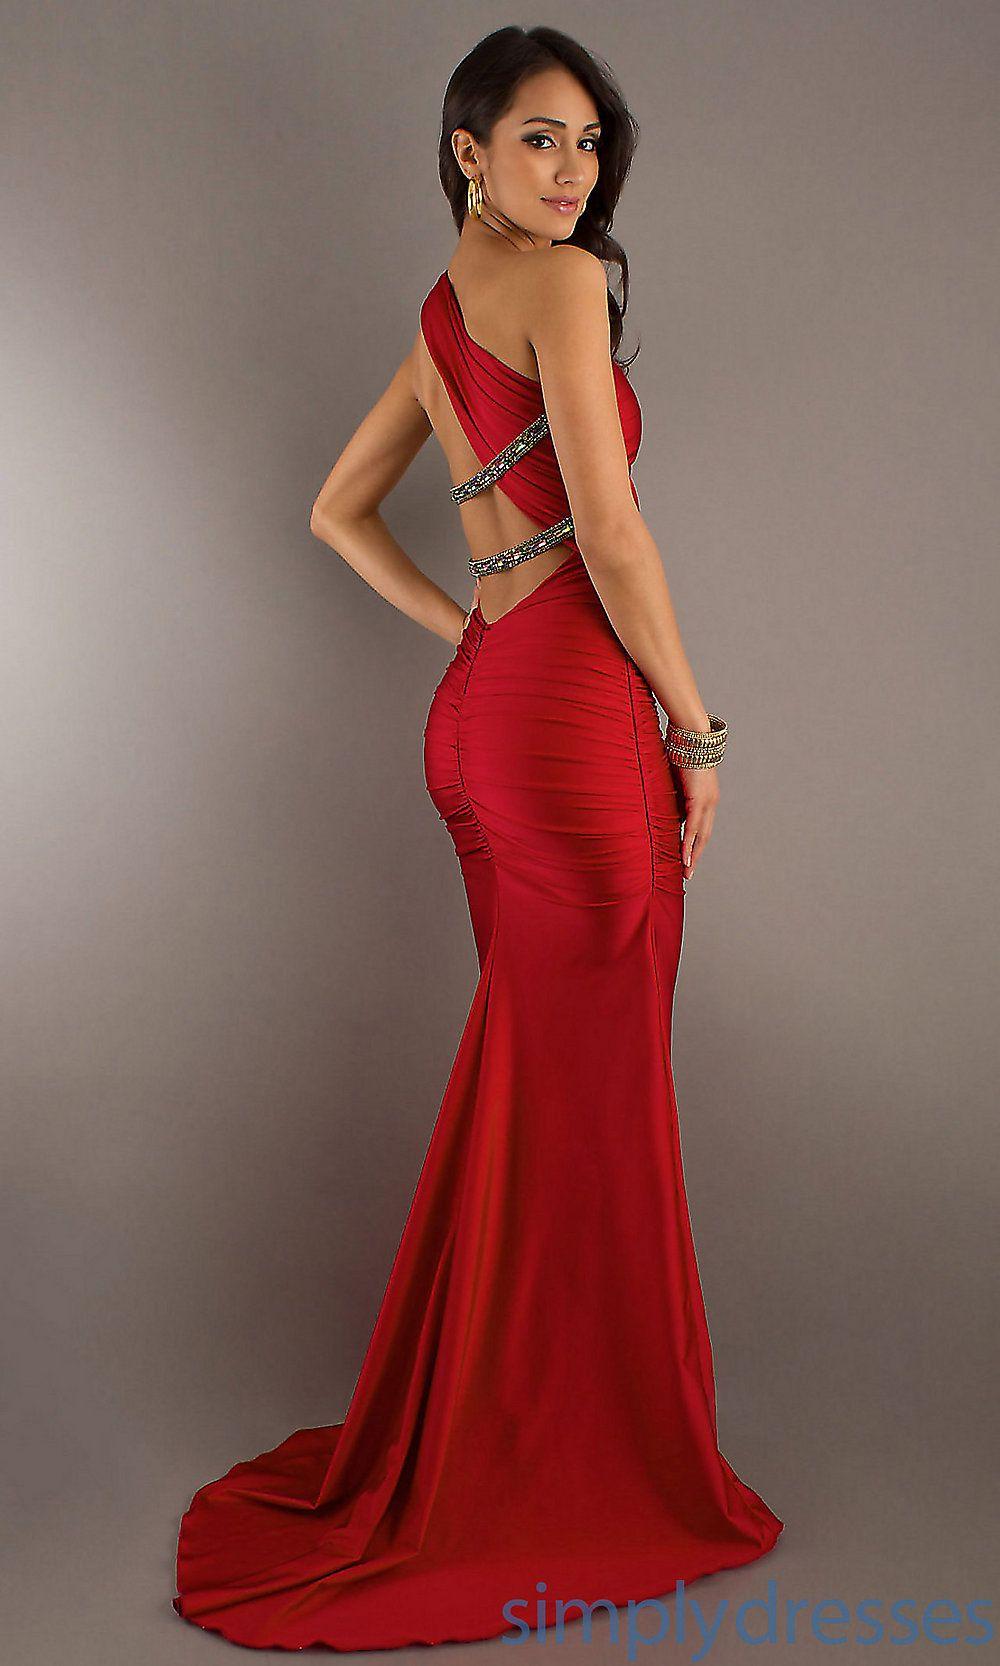 Wedding Red Long Dresses at ac2054 floor length one shoulder backless dress by atria atria